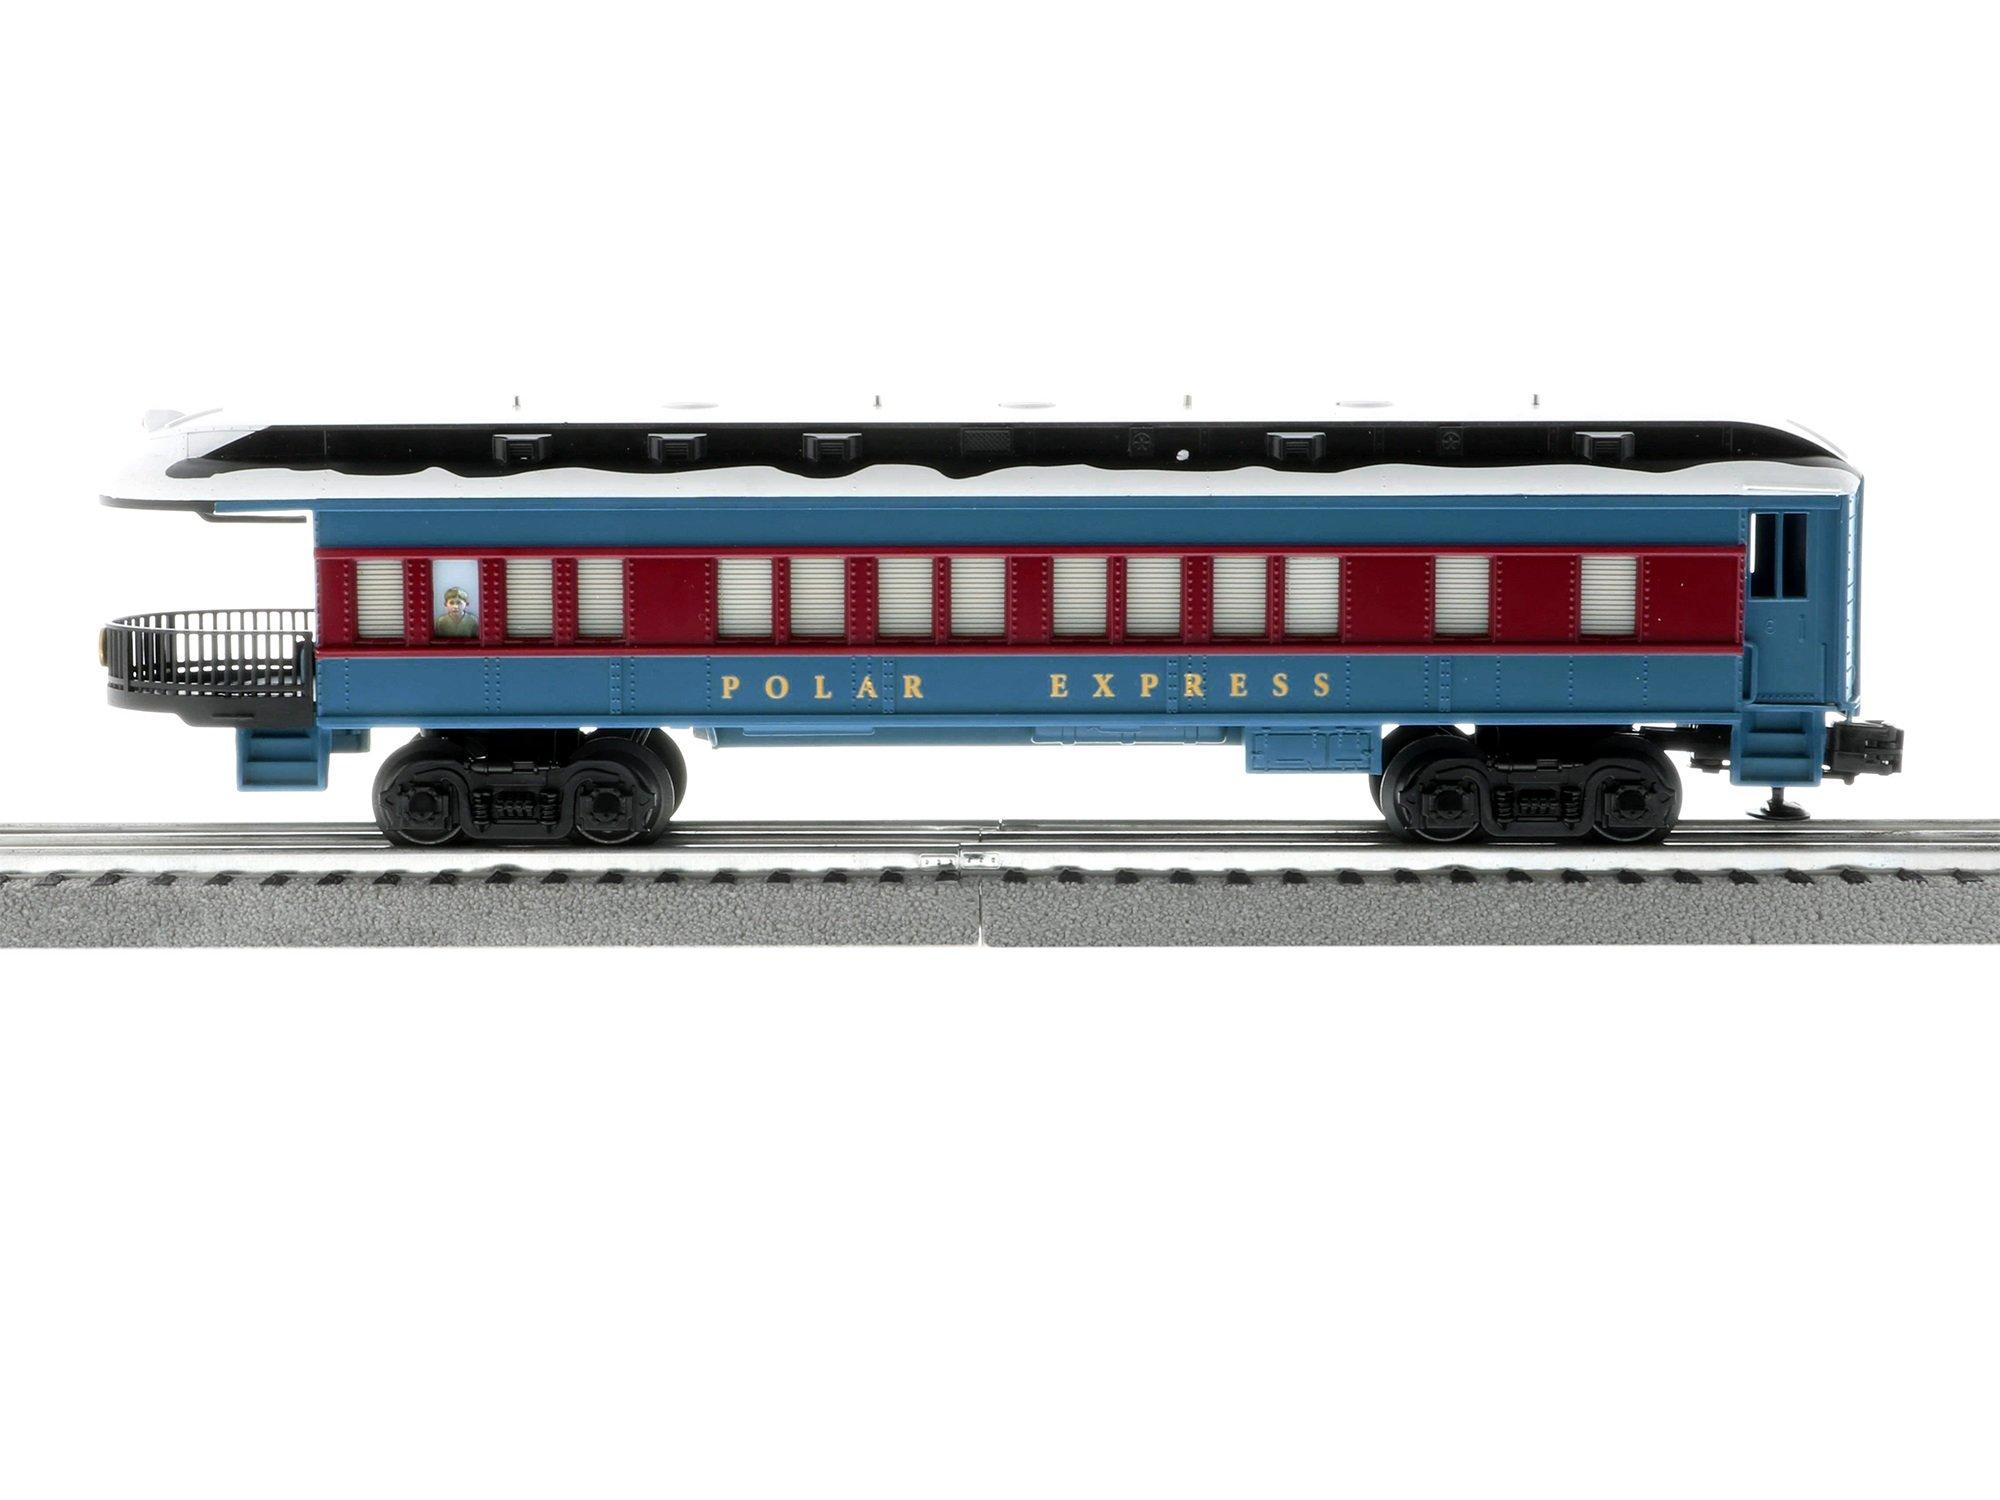 Lionel The Polar Express LionChief Train Set with Bluetooth Train Set by Lionel (Image #8)